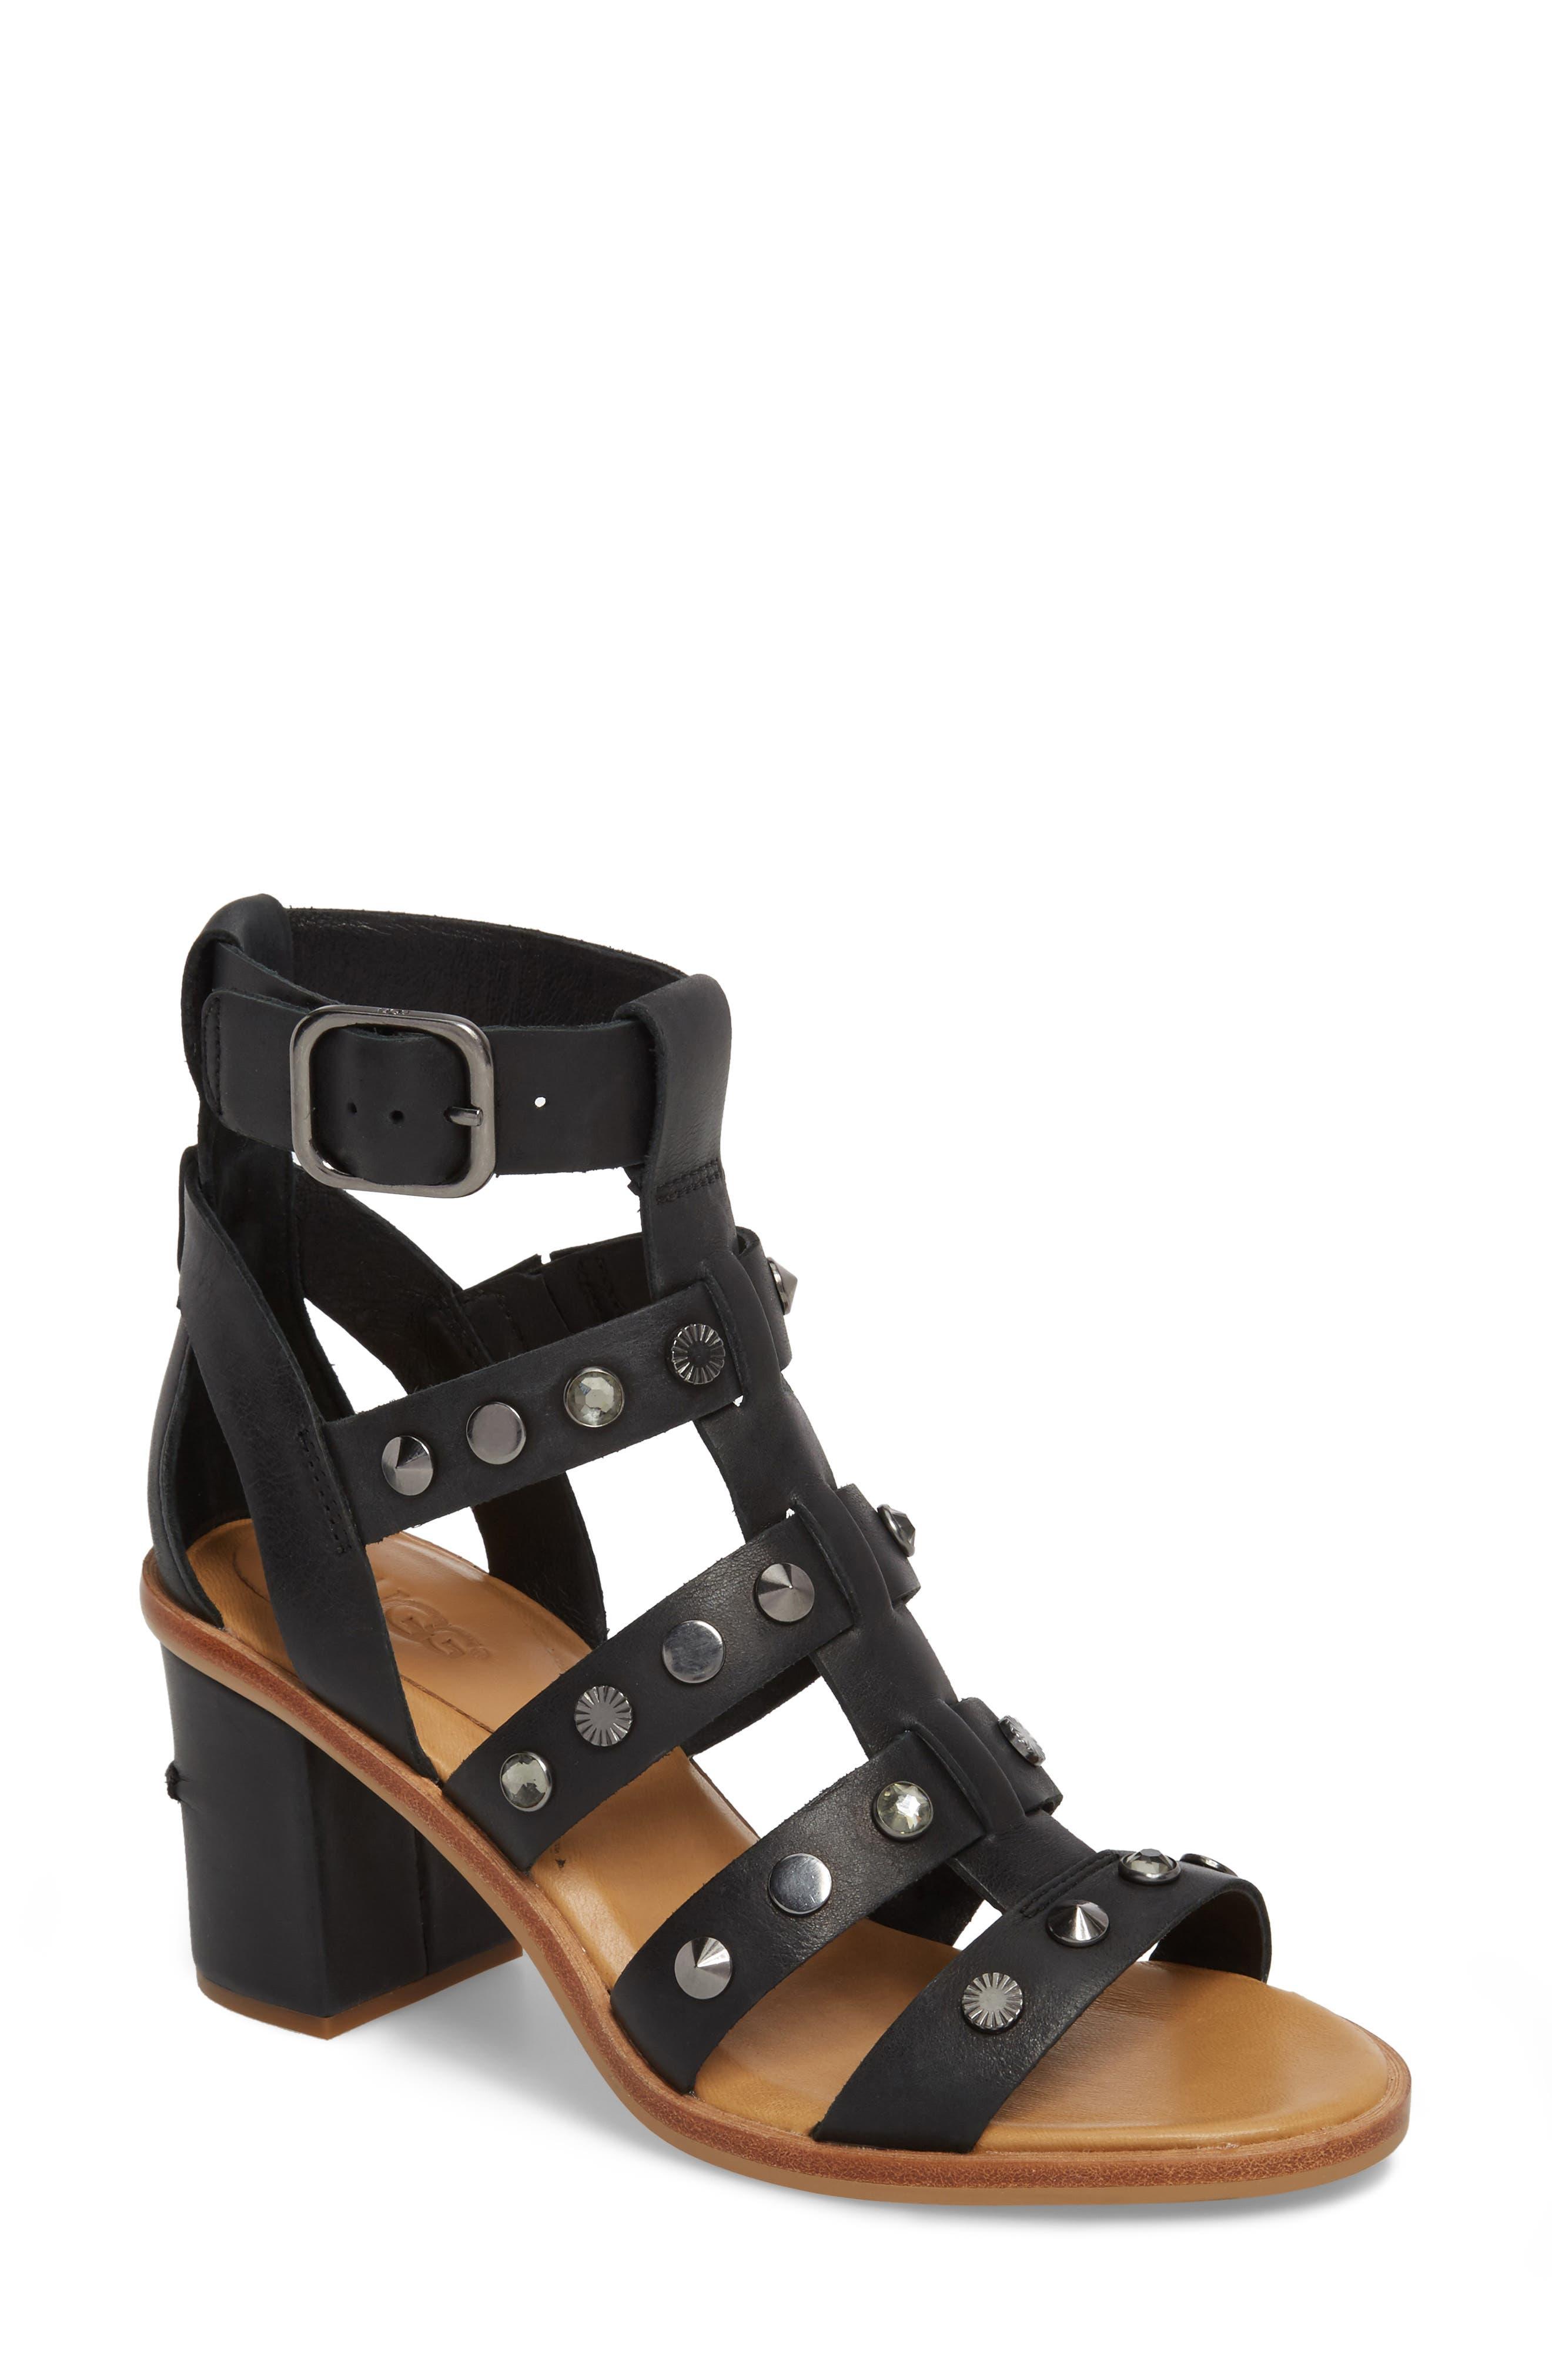 Macayla Studded Sandal,                         Main,                         color, BLACK LEATHER